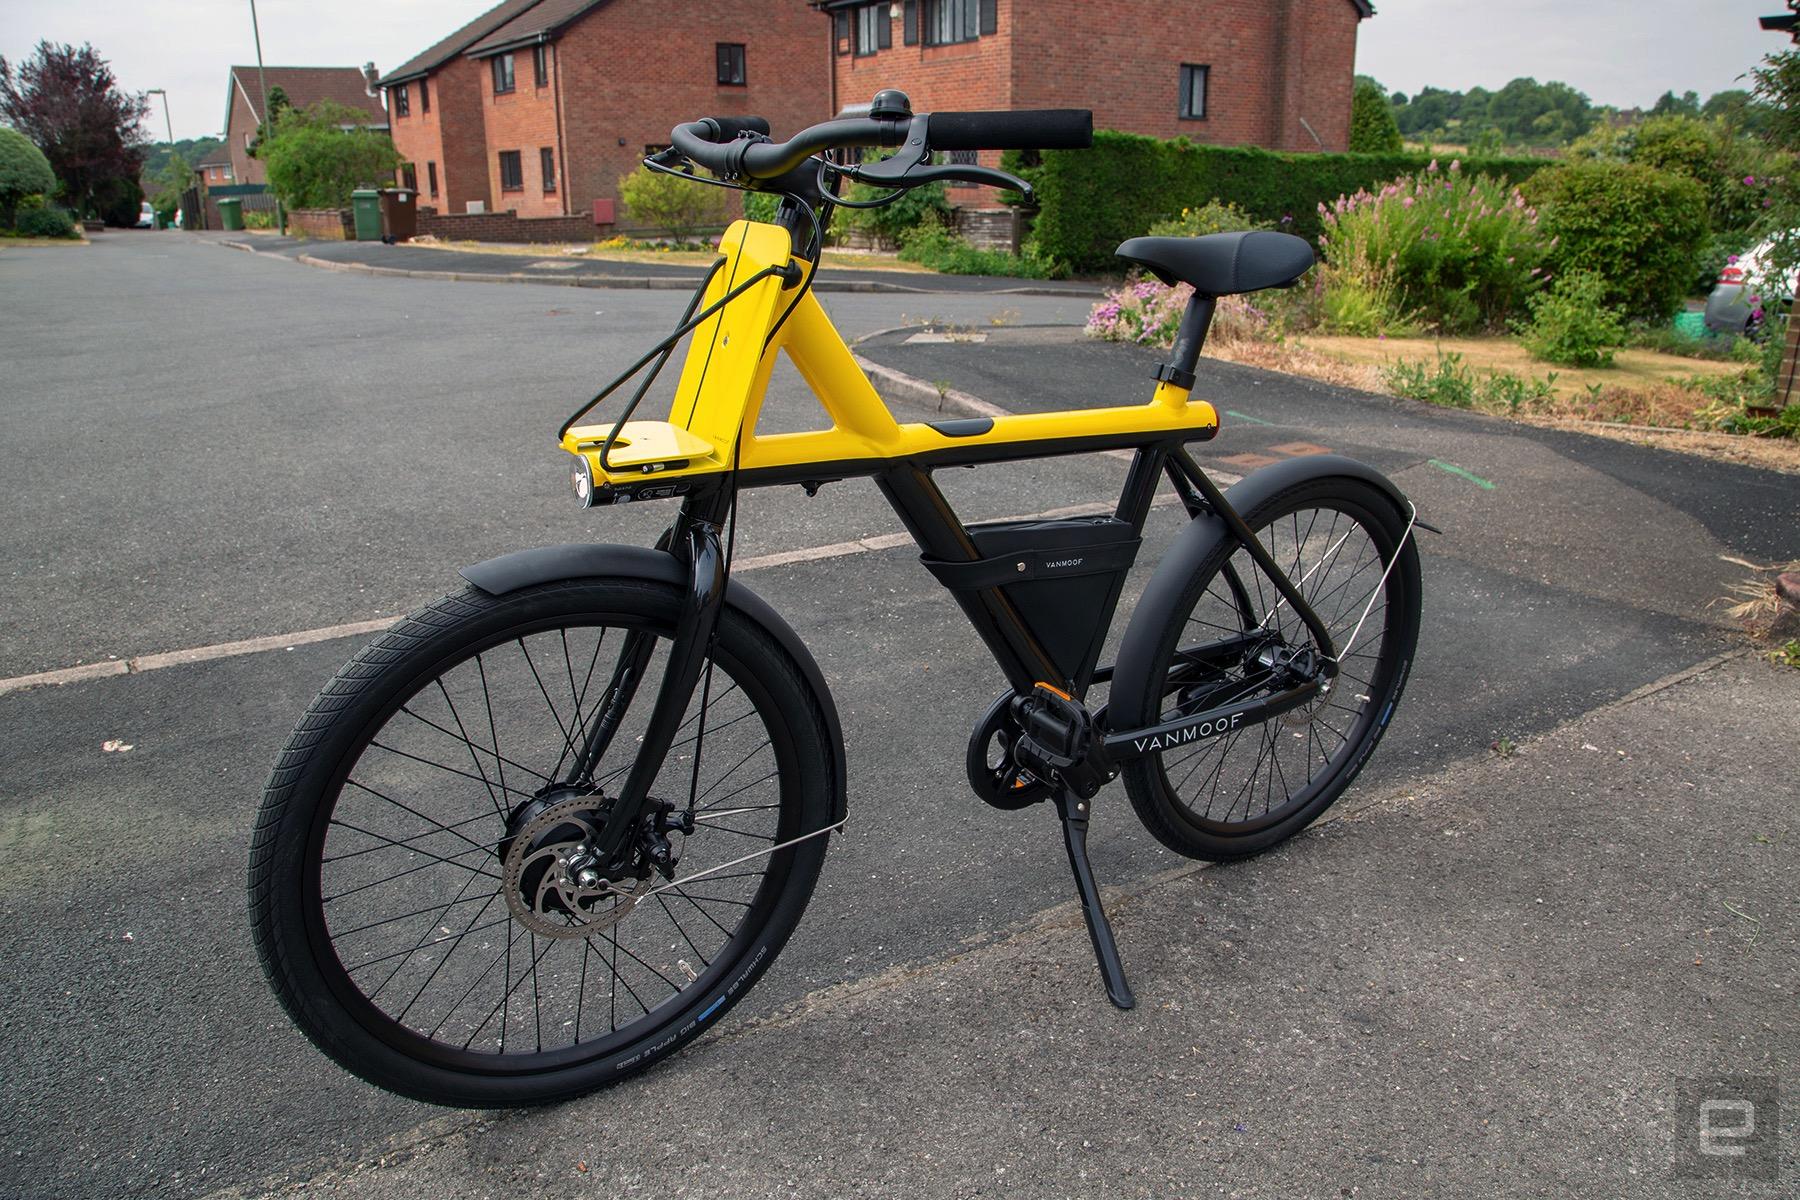 vanmoof electrified x e bike review autoblog. Black Bedroom Furniture Sets. Home Design Ideas